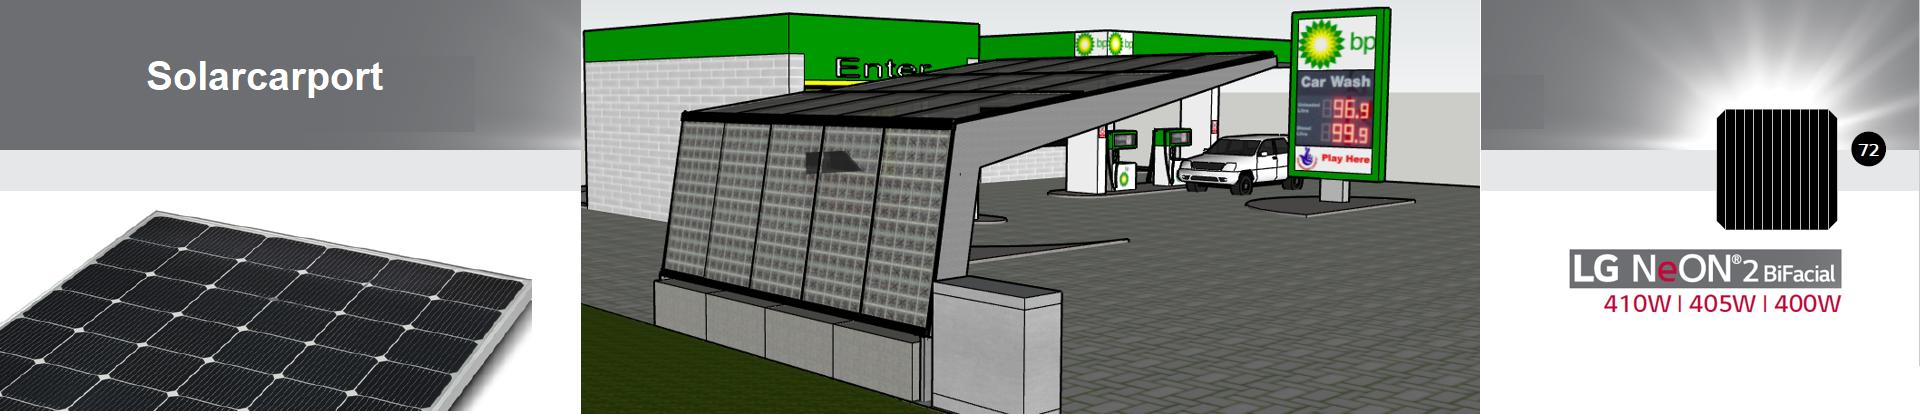 Solarcarport mit Ladestation